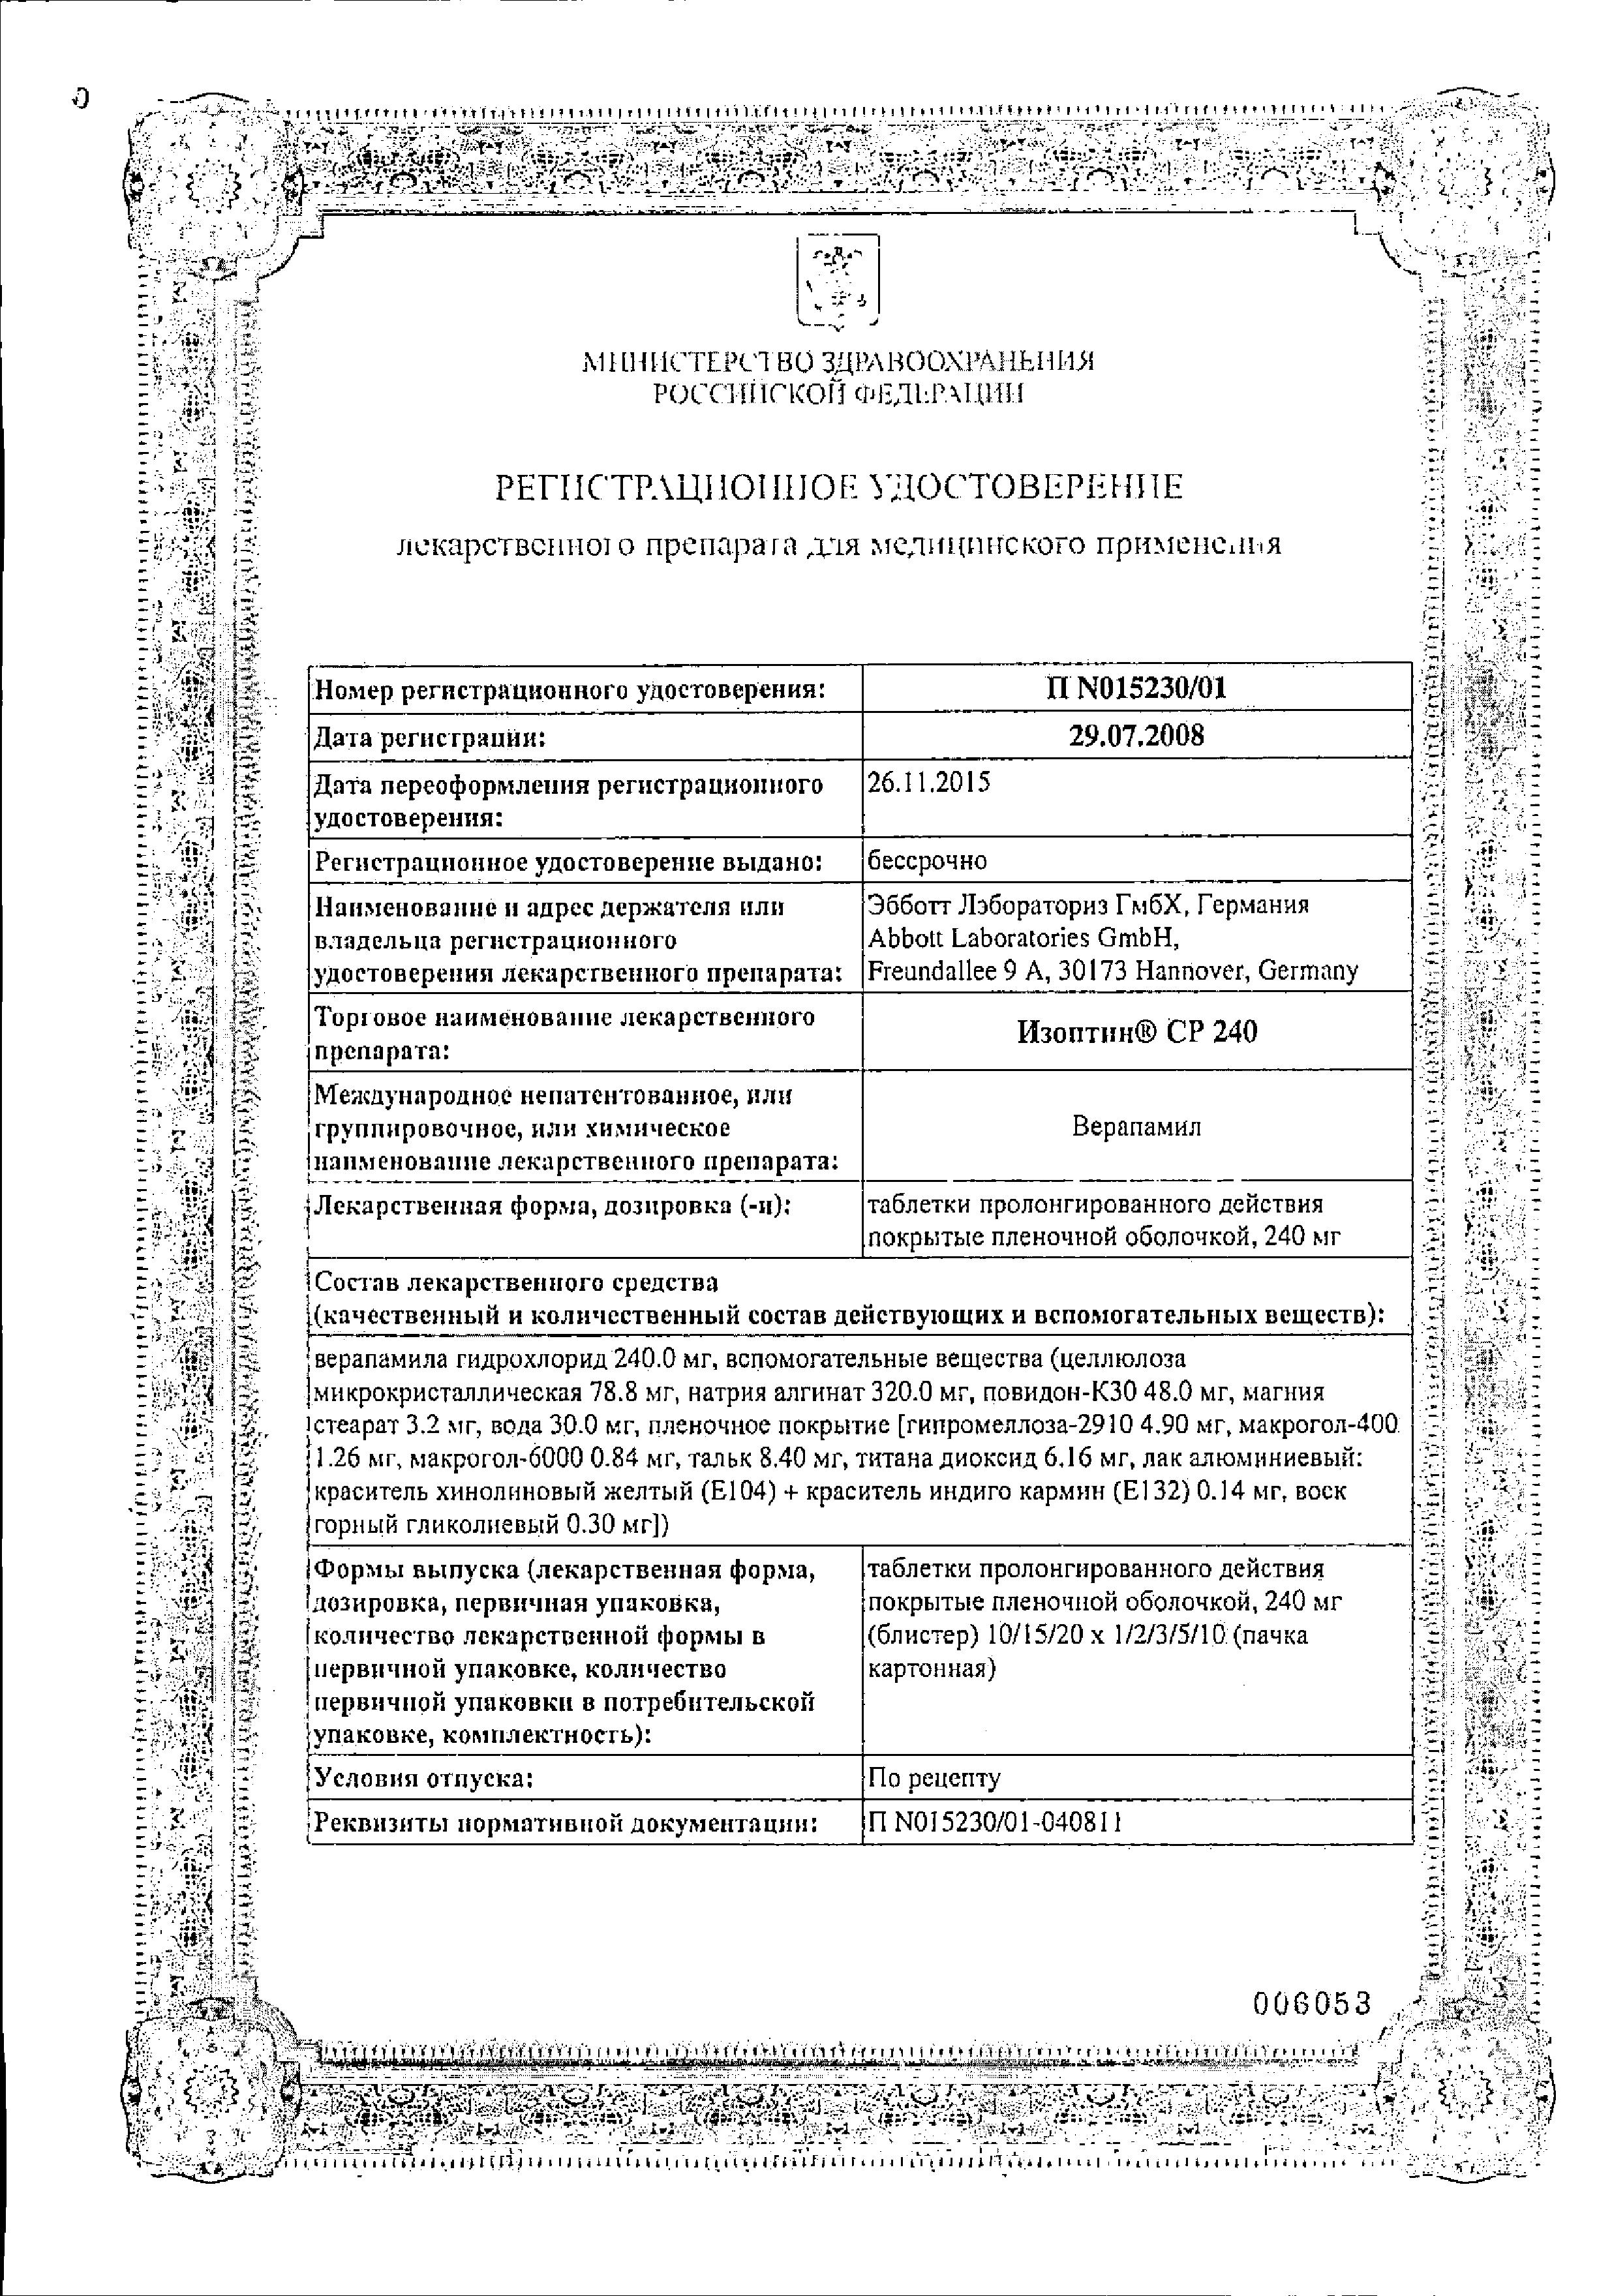 Изоптин СР 240 сертификат